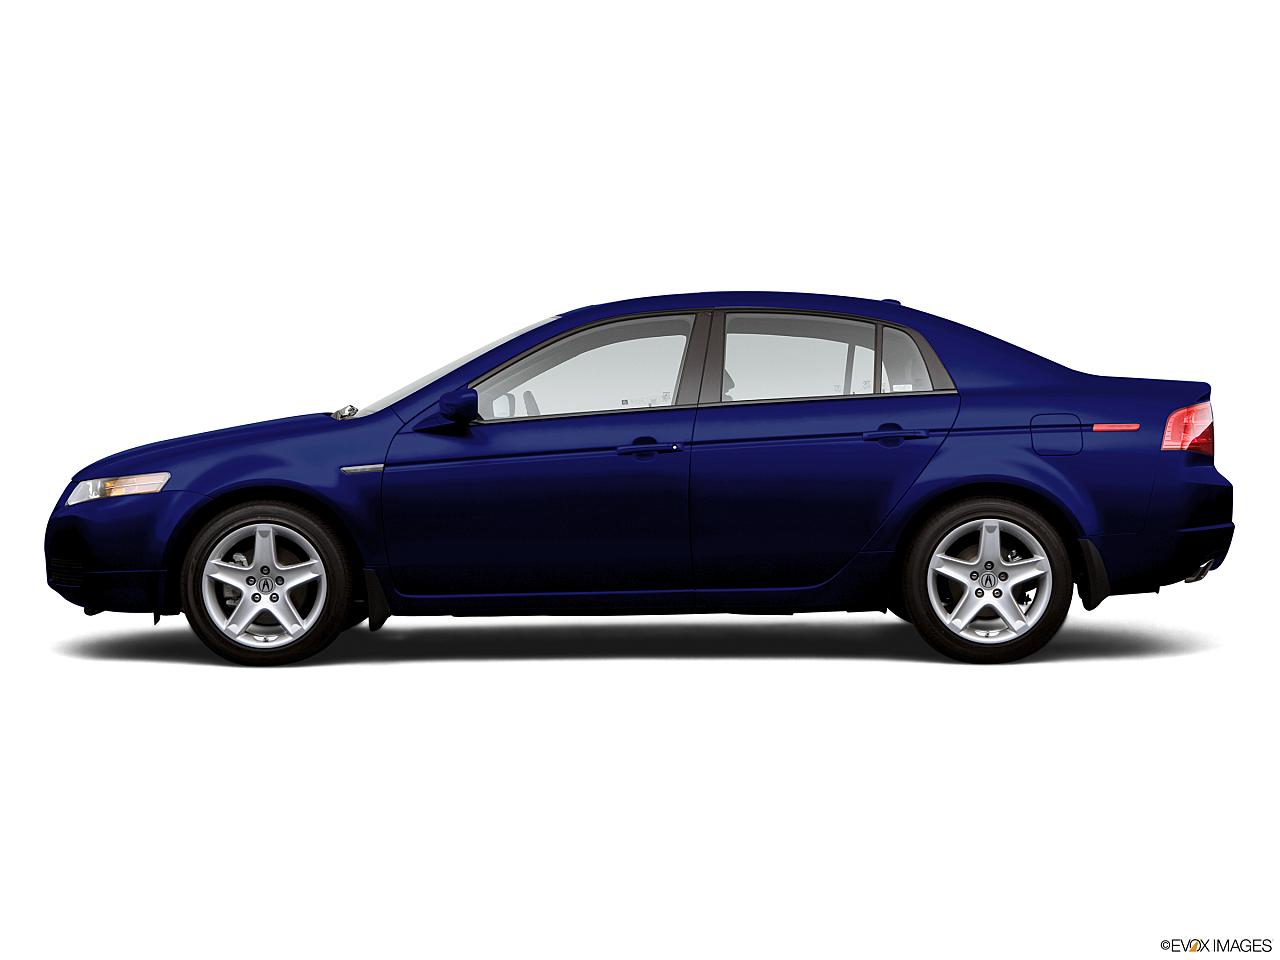 2006 Acura Tl 4dr Sedan 6m Research Groovecar